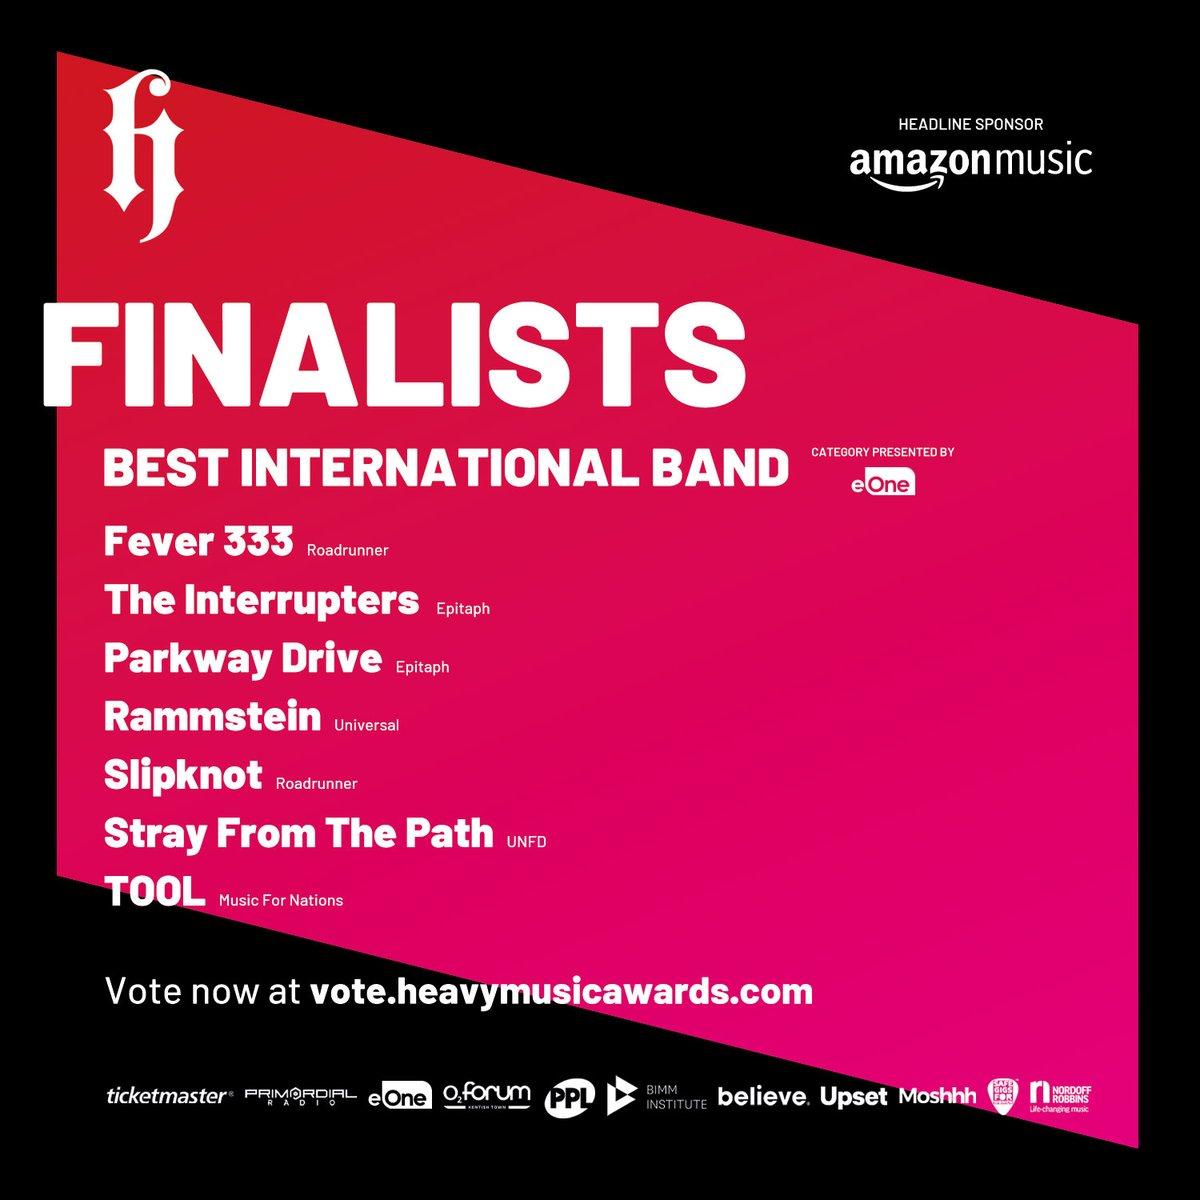 Heavy Music Awards 2020 Finalists Best International Band - Presented by eOne  >>> https://t.co/bm4DfMj6yQ  #HMA20 #Fever333 #TheInterrupters #ParkwayDrive #Rammstein #Slipknot #StrayFromThePath #Tool https://t.co/s3doFcBQ2I